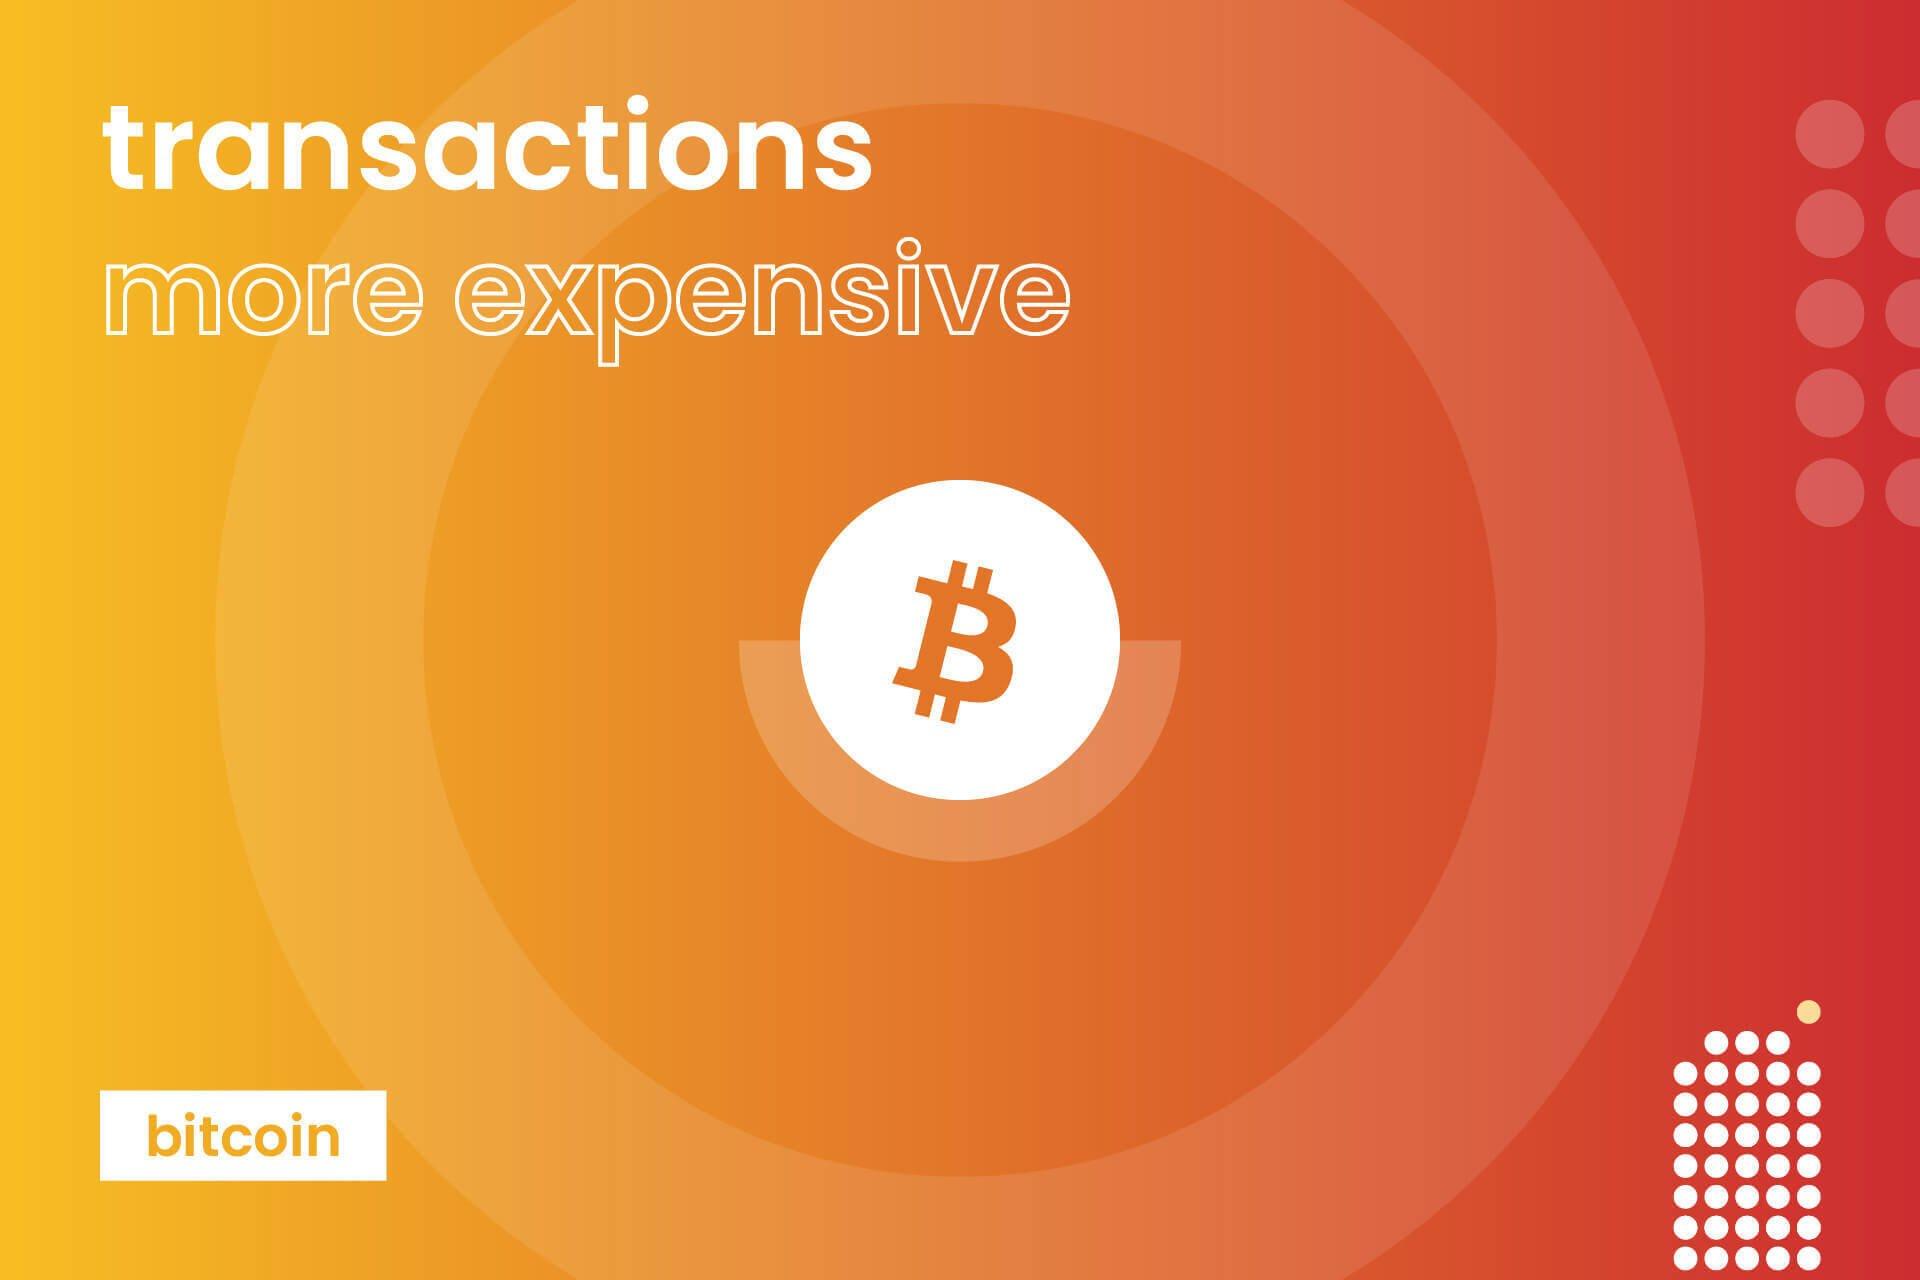 <bold>Bitcoin</bold> <bold>transaction</bold> <bold>fee</bold> increased before May